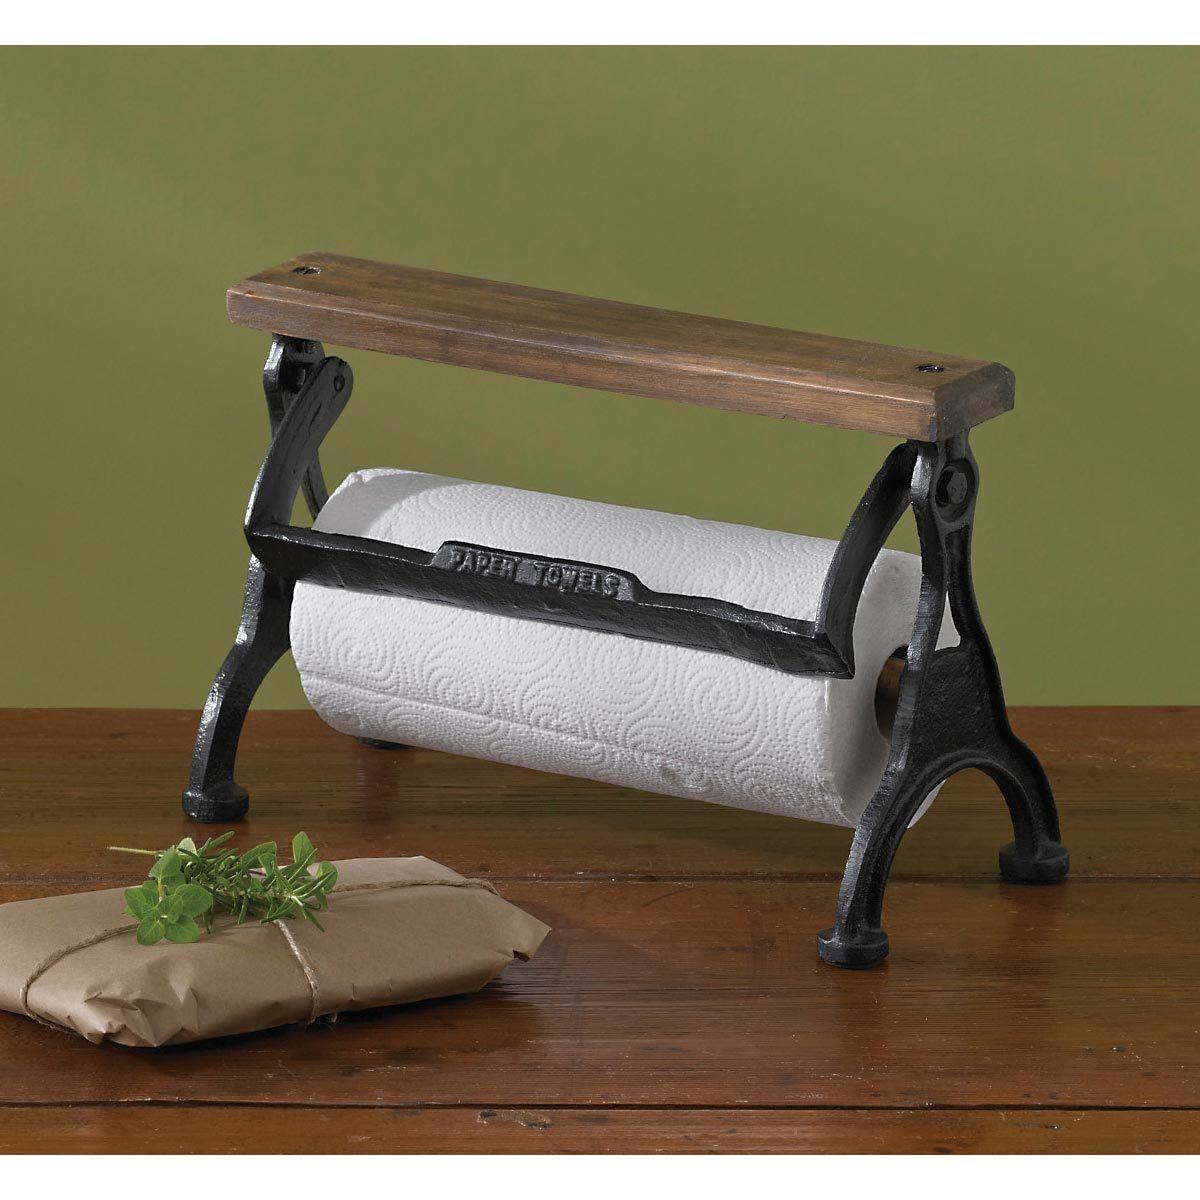 paper towel holder. Picture 1 of Park Designs Vintage Style Counter Top Paper Towel Holder Wood